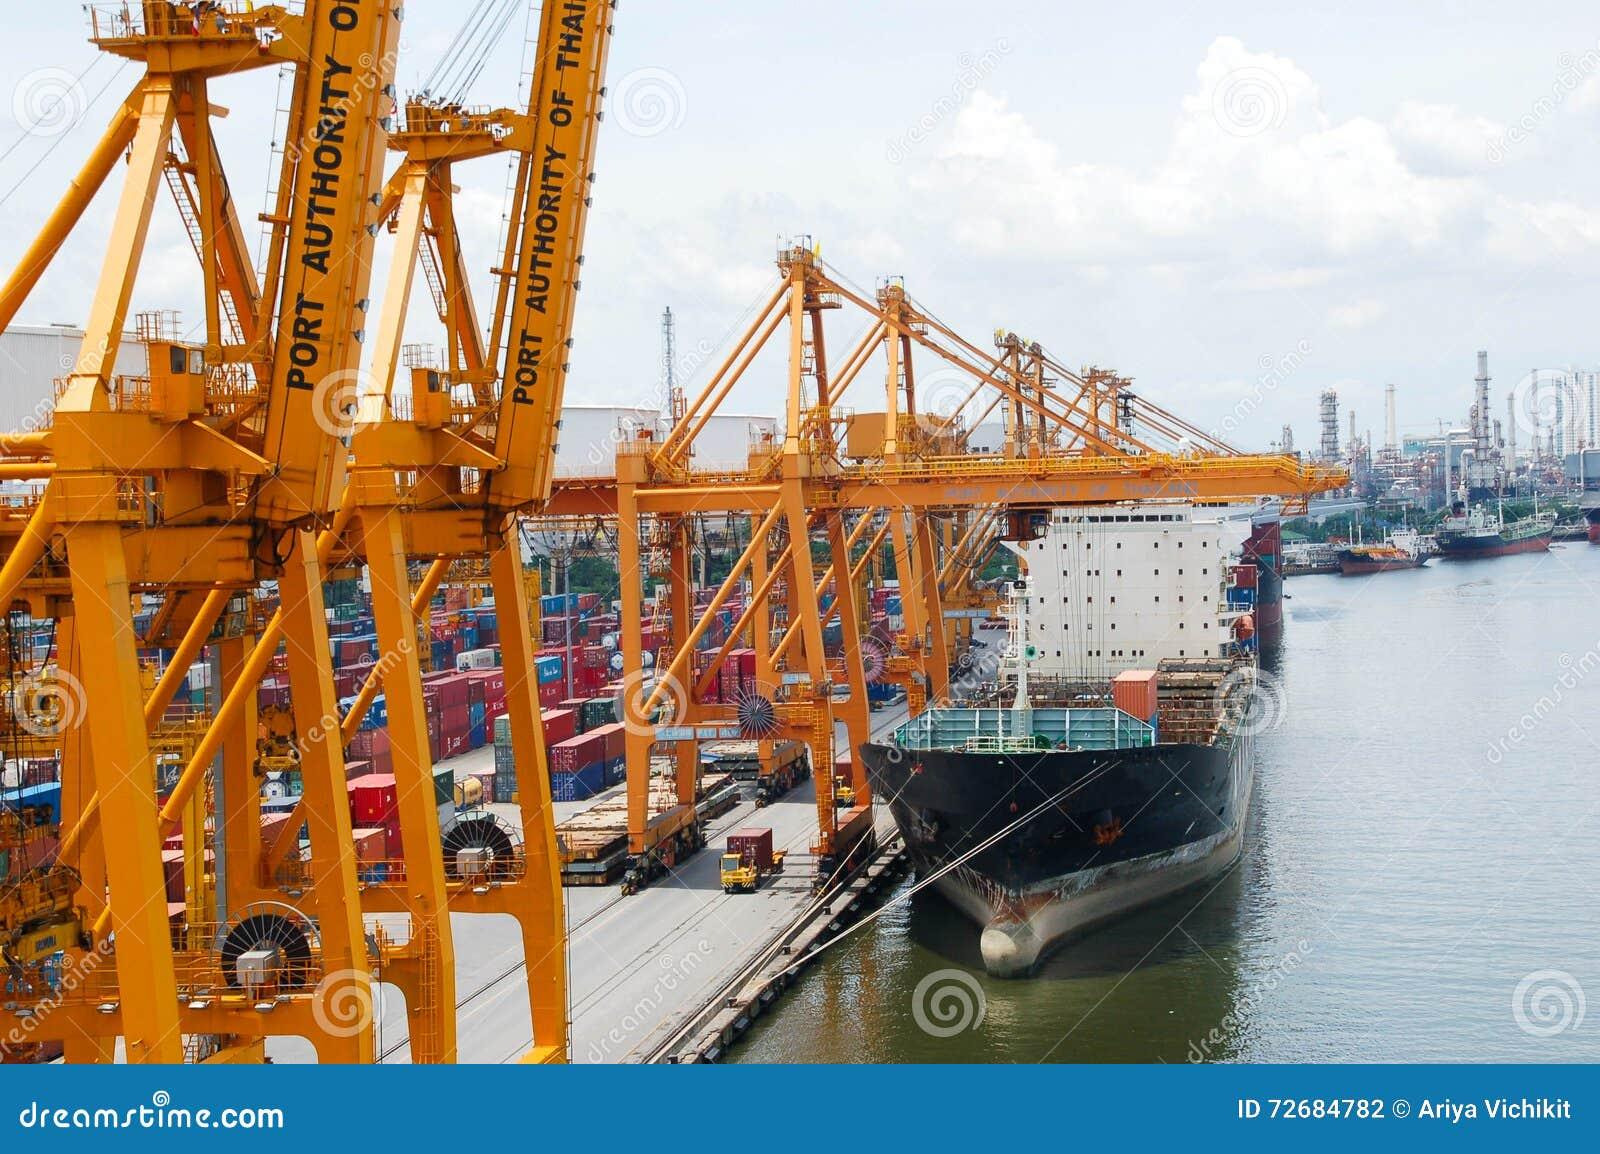 Boat Freight Transportation And Bangkok City Editorial